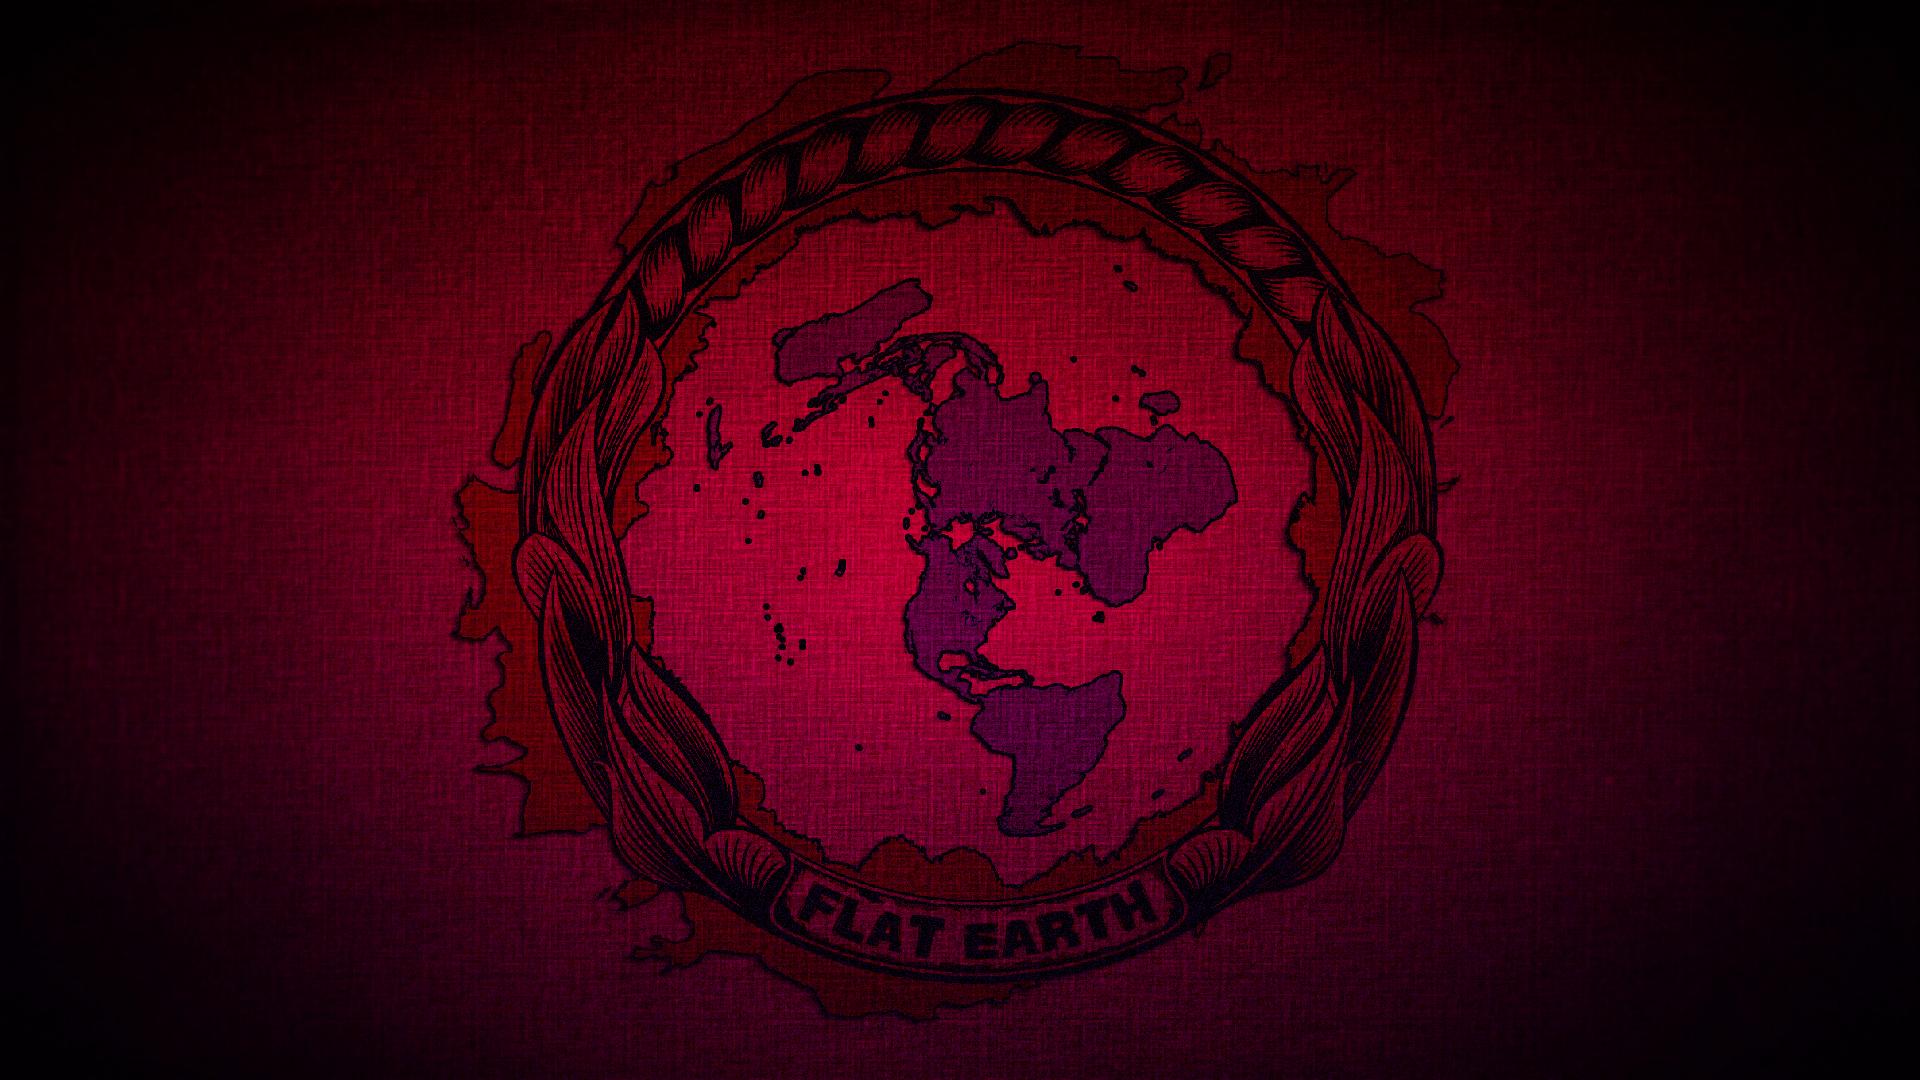 Wallpaper Hd Flat Earth